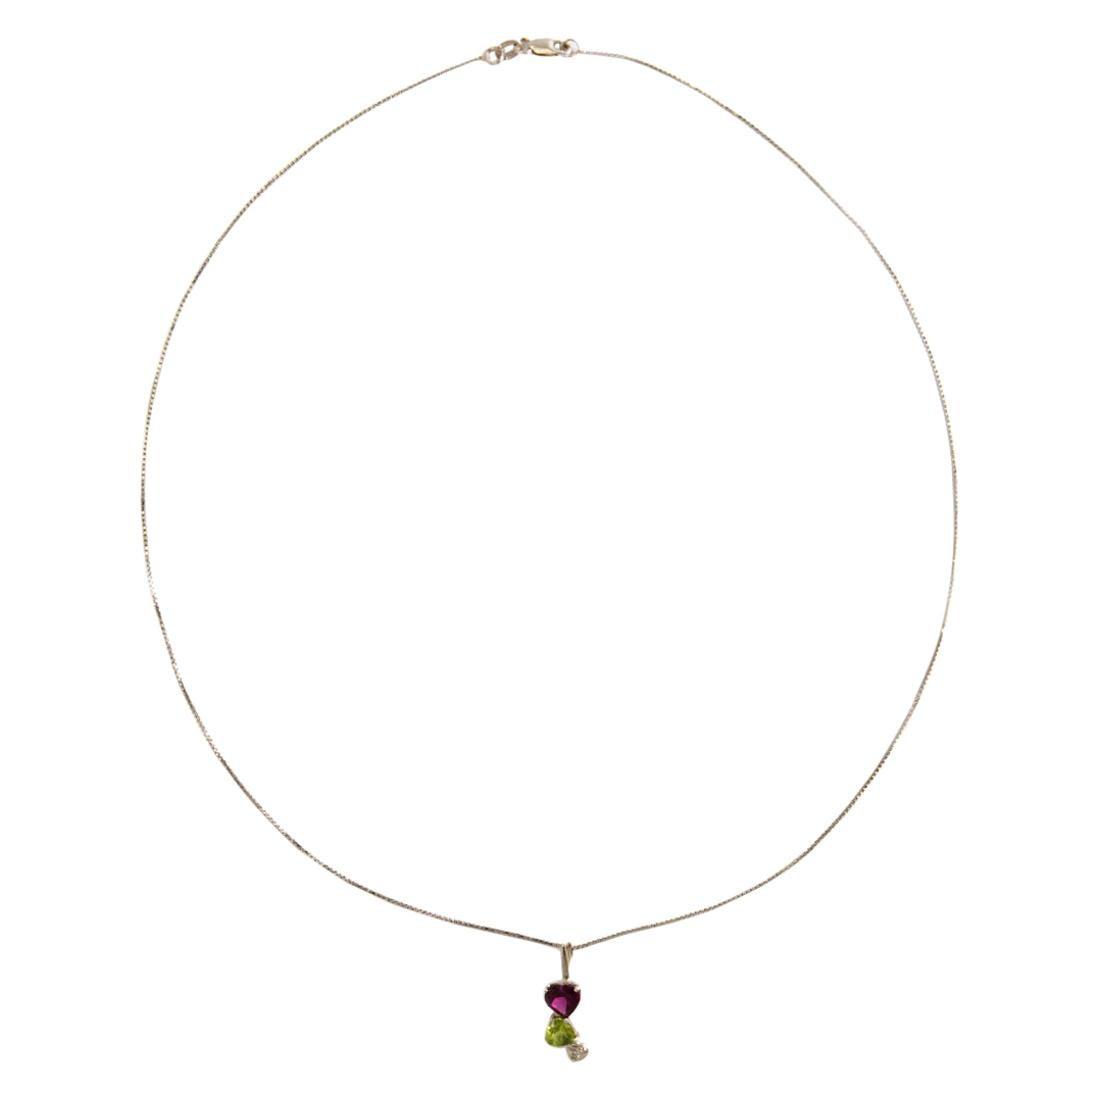 Amethyst Peridot Diamond Pendant Necklace